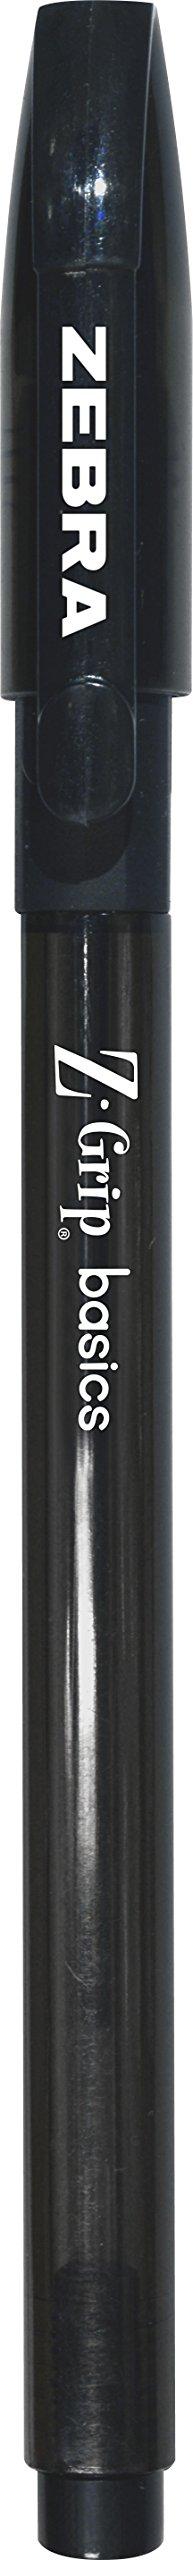 Zebra Pen Z-Grip Basics Stick Pen, Medium Point,1.0mm, Black Ink, 12-Count